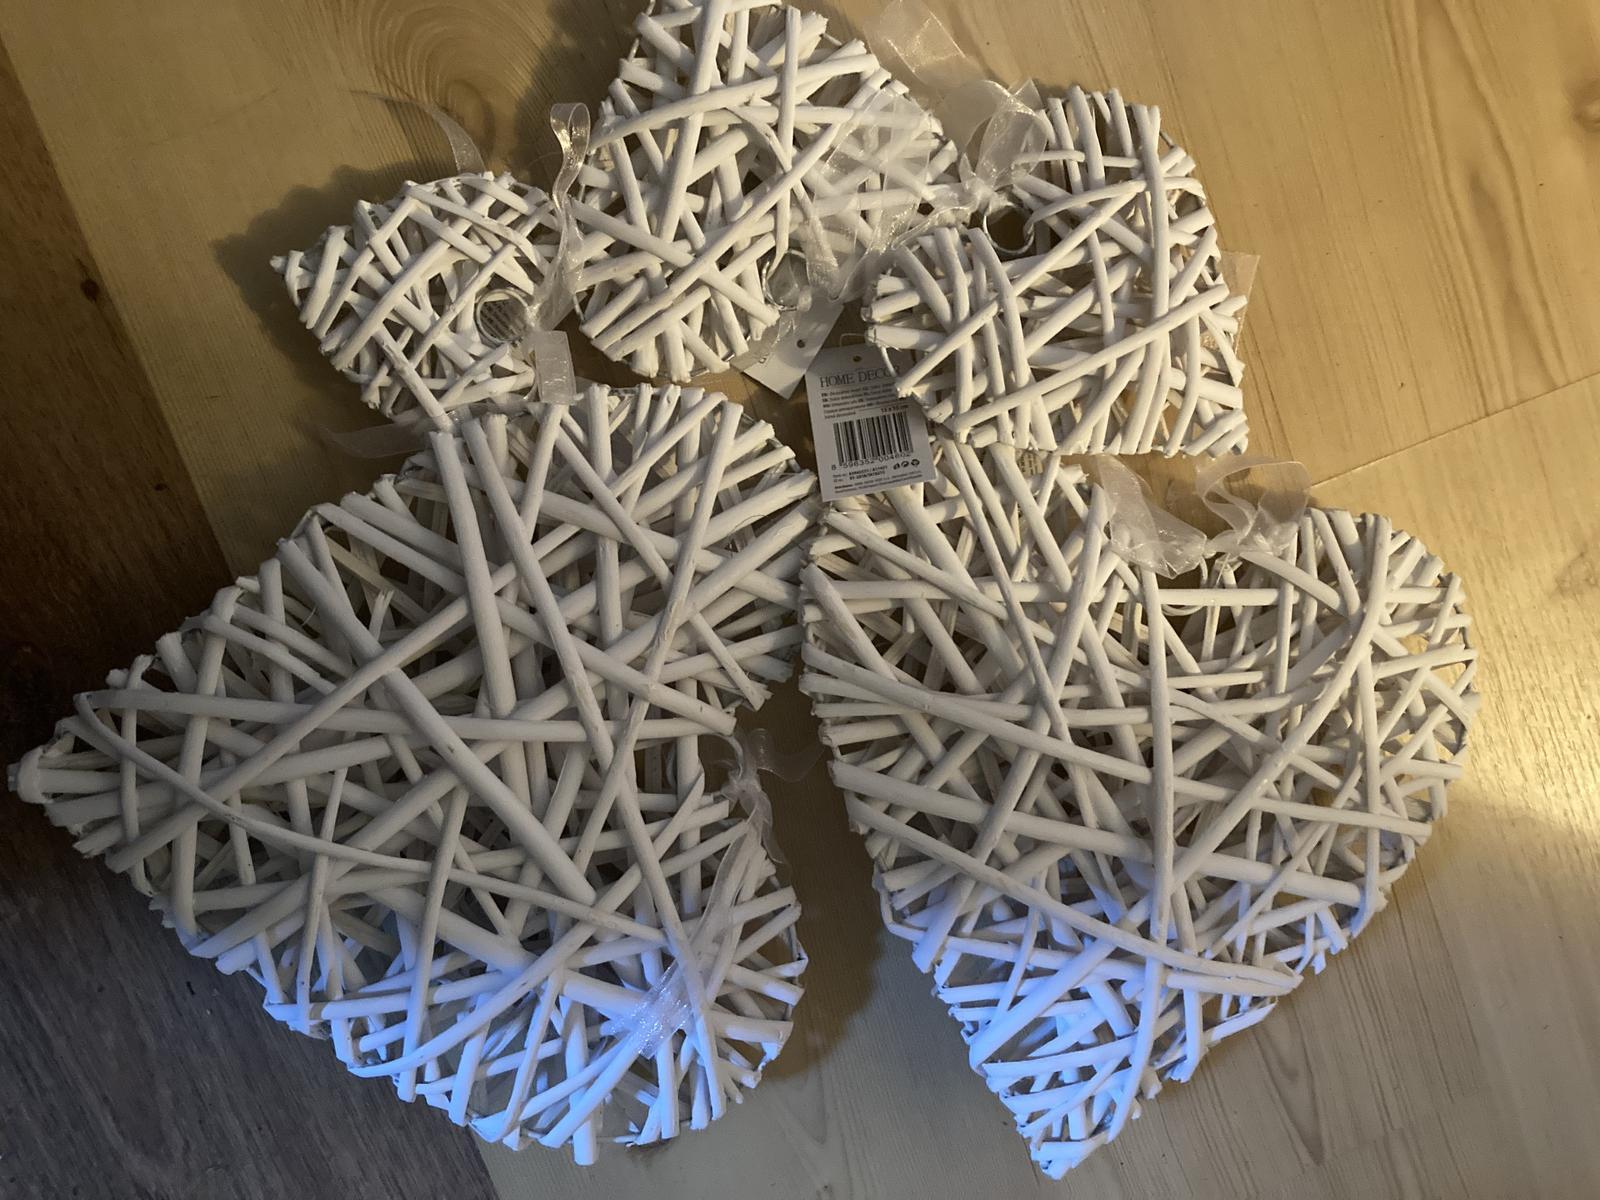 dekorace srdce - Obrázek č. 1